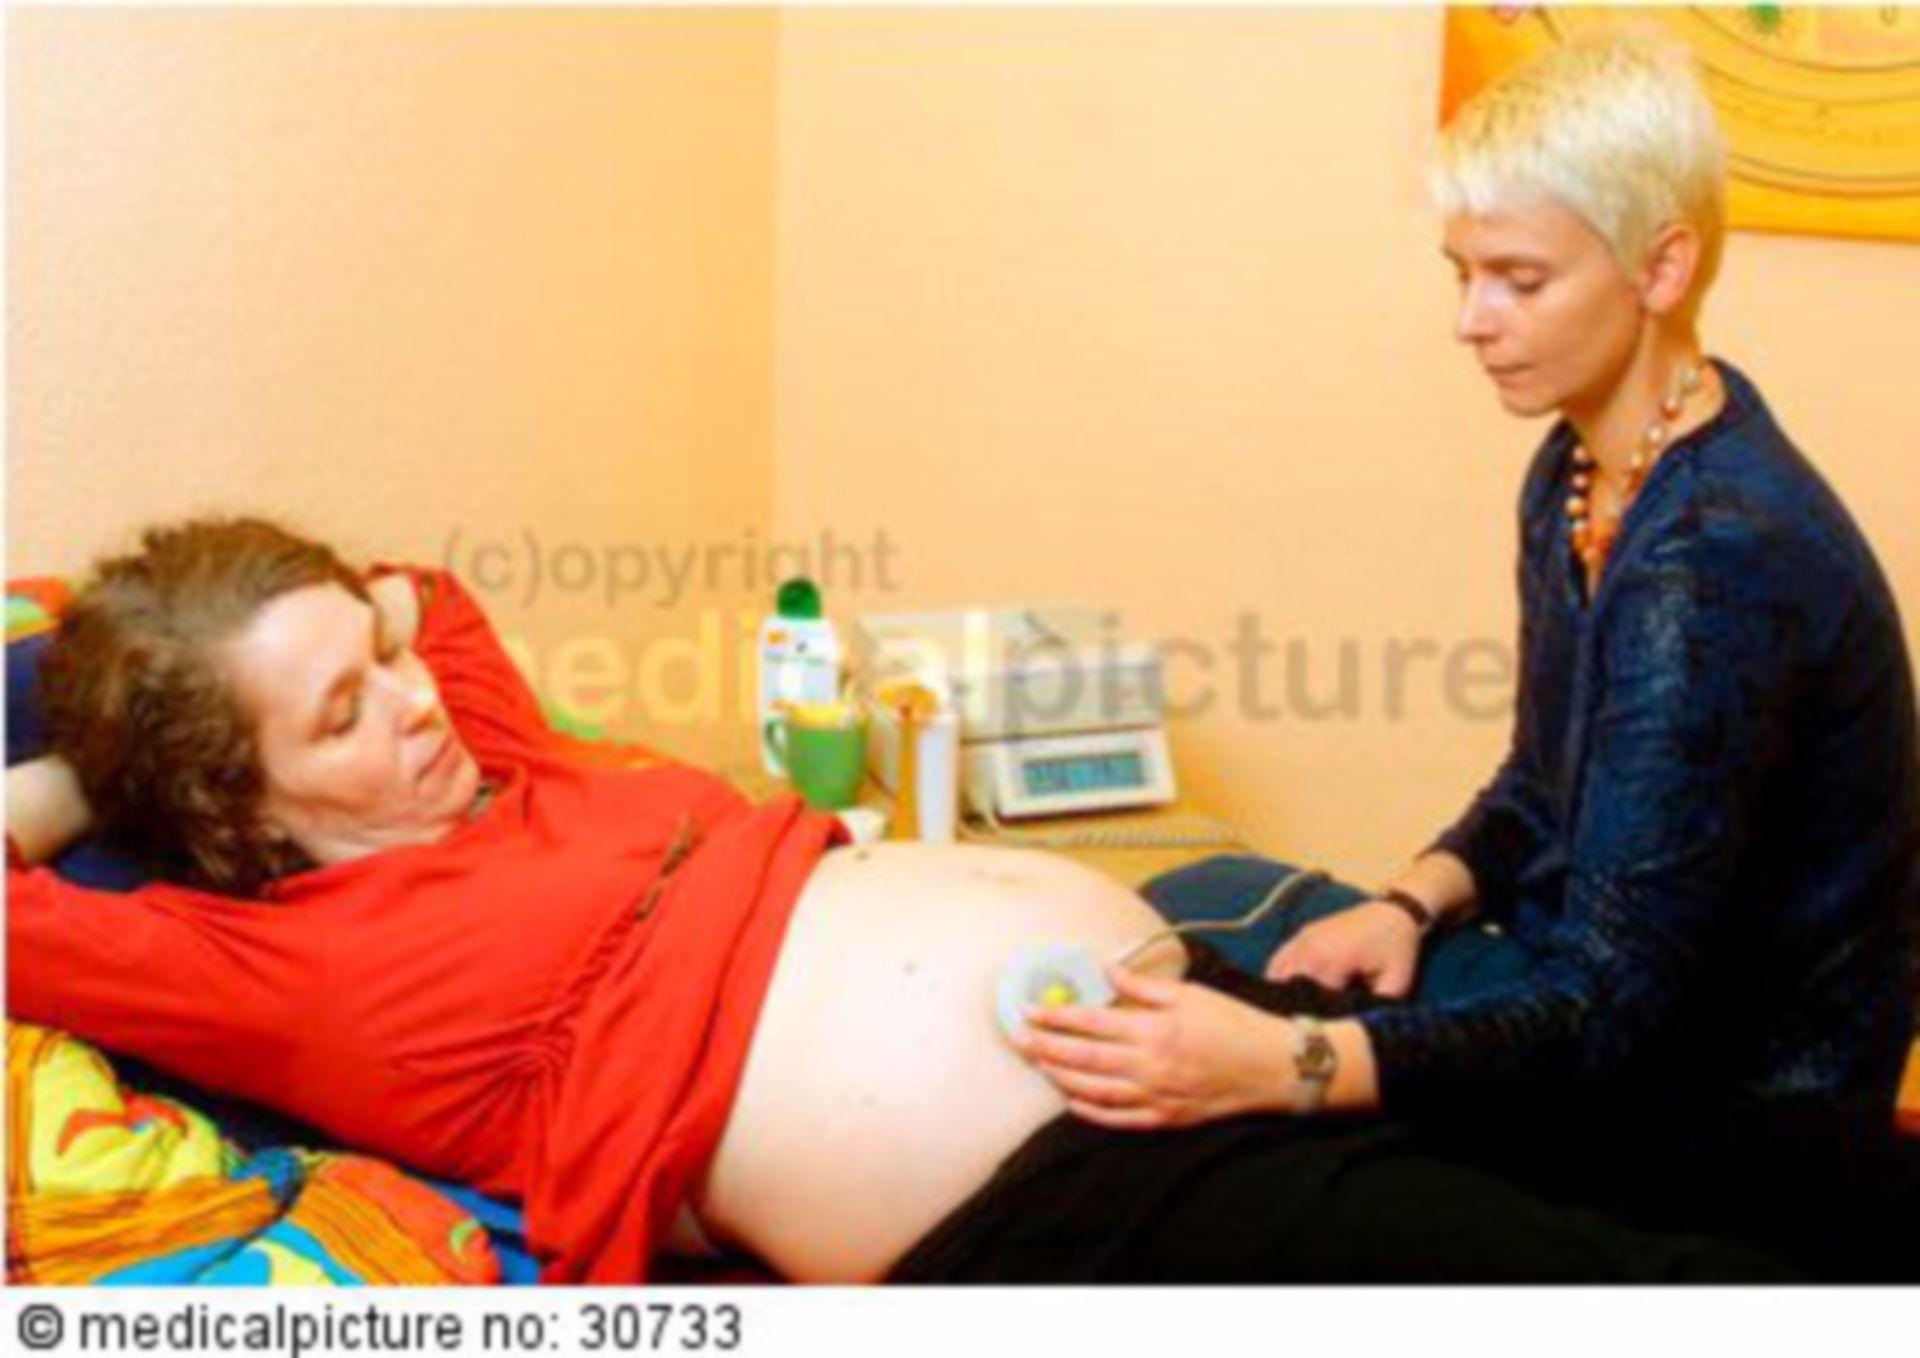 Hebamme untersucht Schwangere